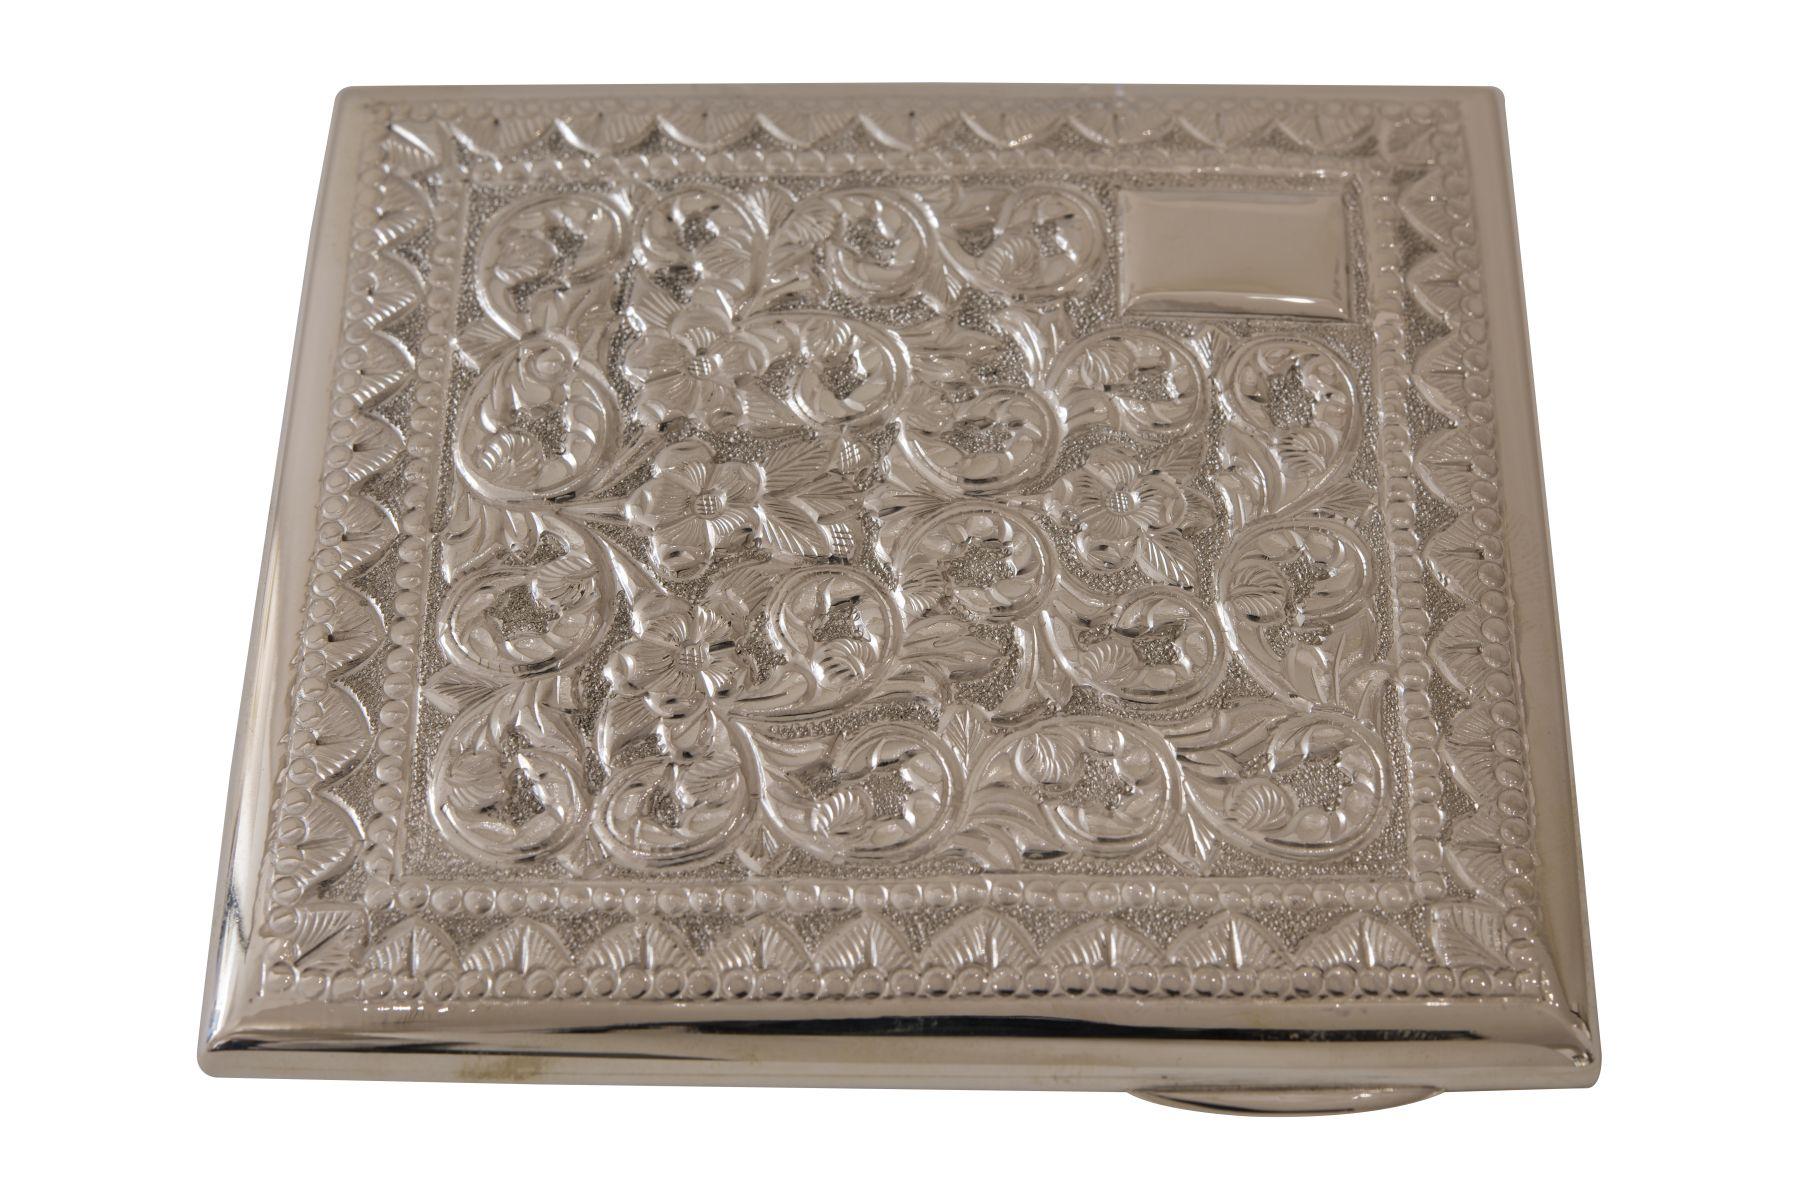 #74 Silver box | Silberdose Image